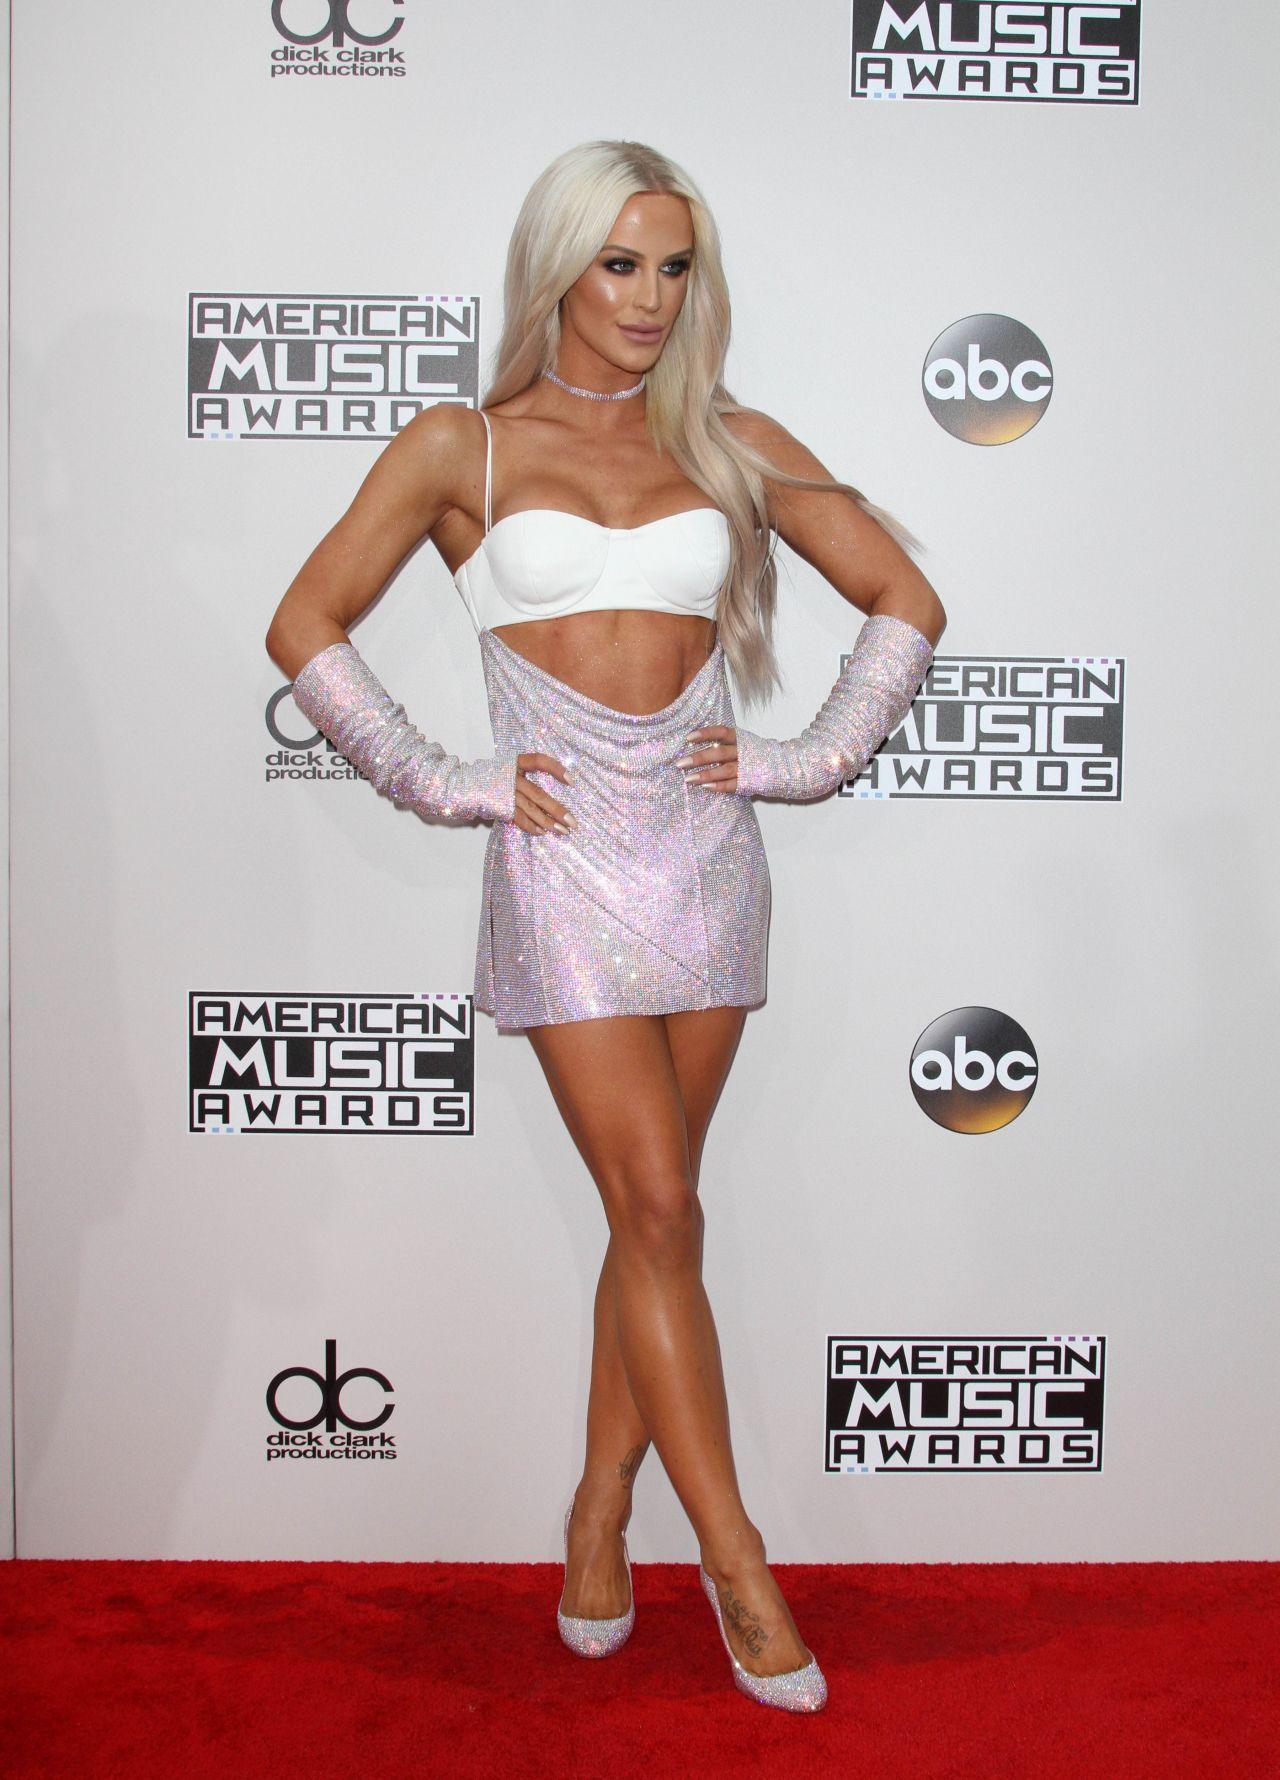 Pin By Kody Bettis On Gigi Gorgeous American Music Awards